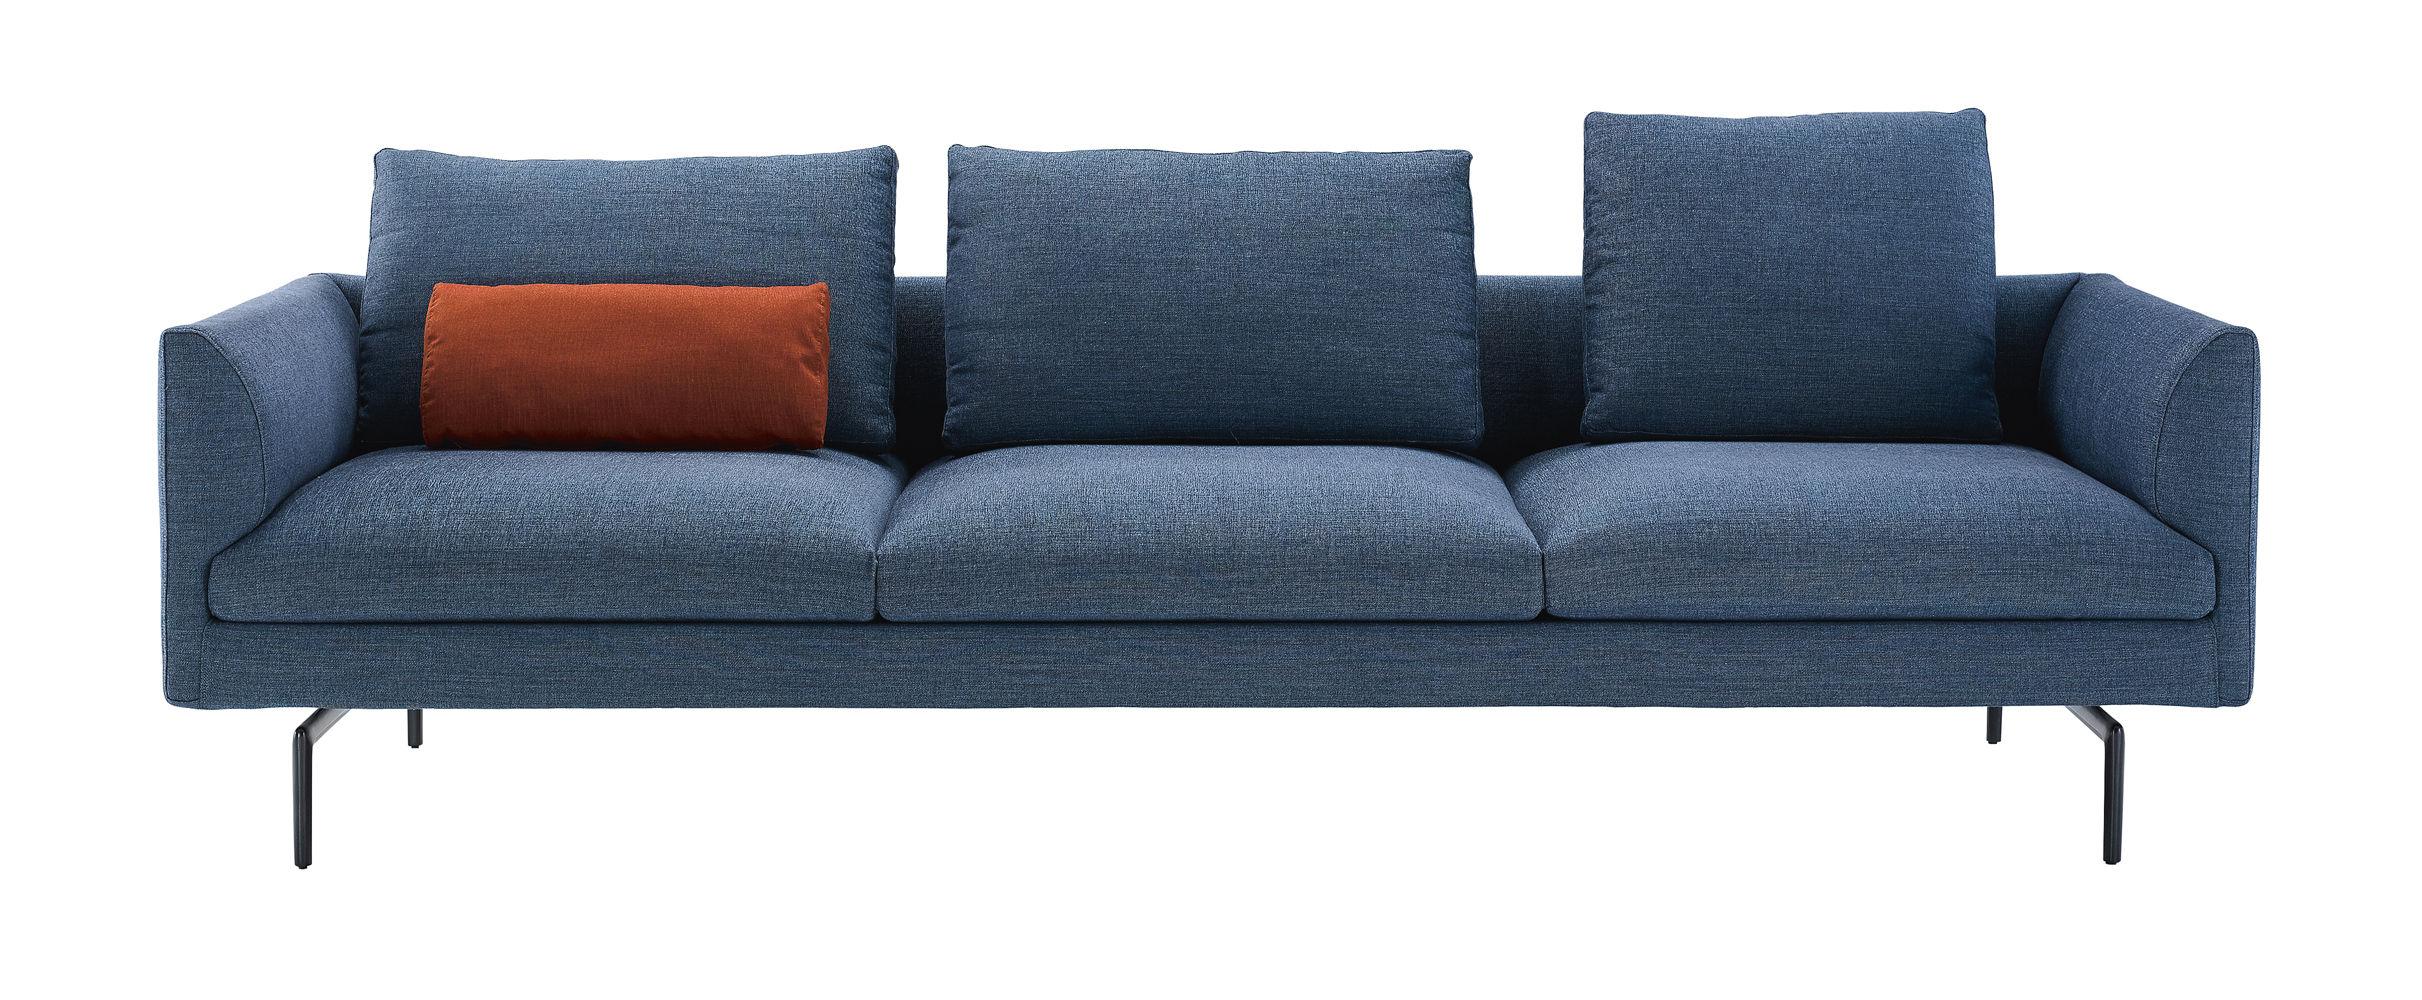 Flamingo / 3-Sitzer - L 261 cm   Zanotta   Sofa